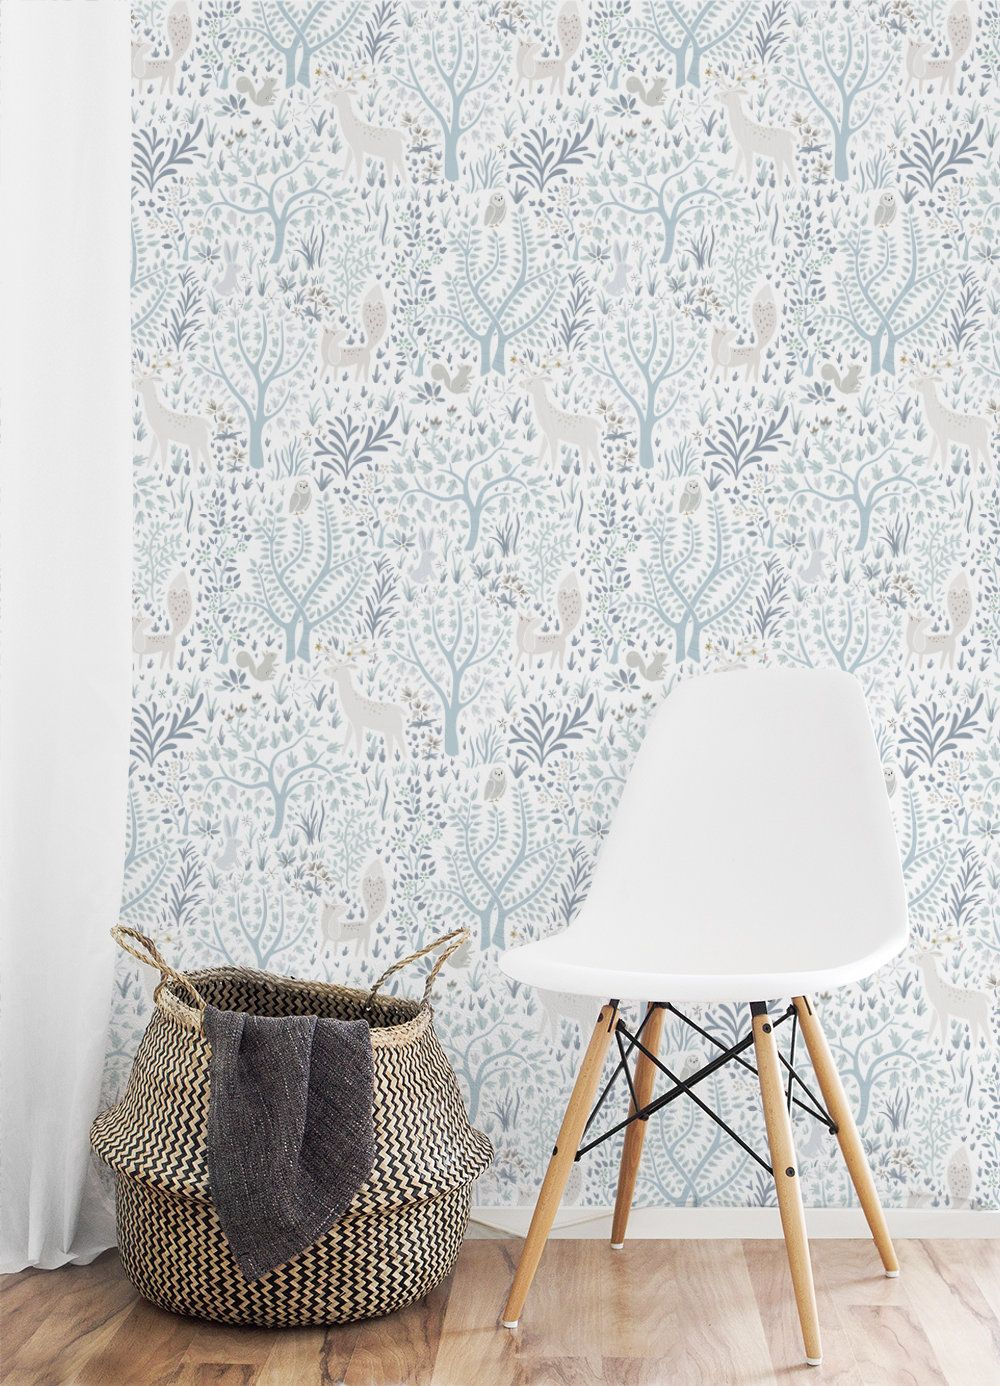 Light Woodland Forest Removable Wallpaper 508 Etsy Removable Wallpaper Nursery Nursery Wallpaper Removable Wallpaper